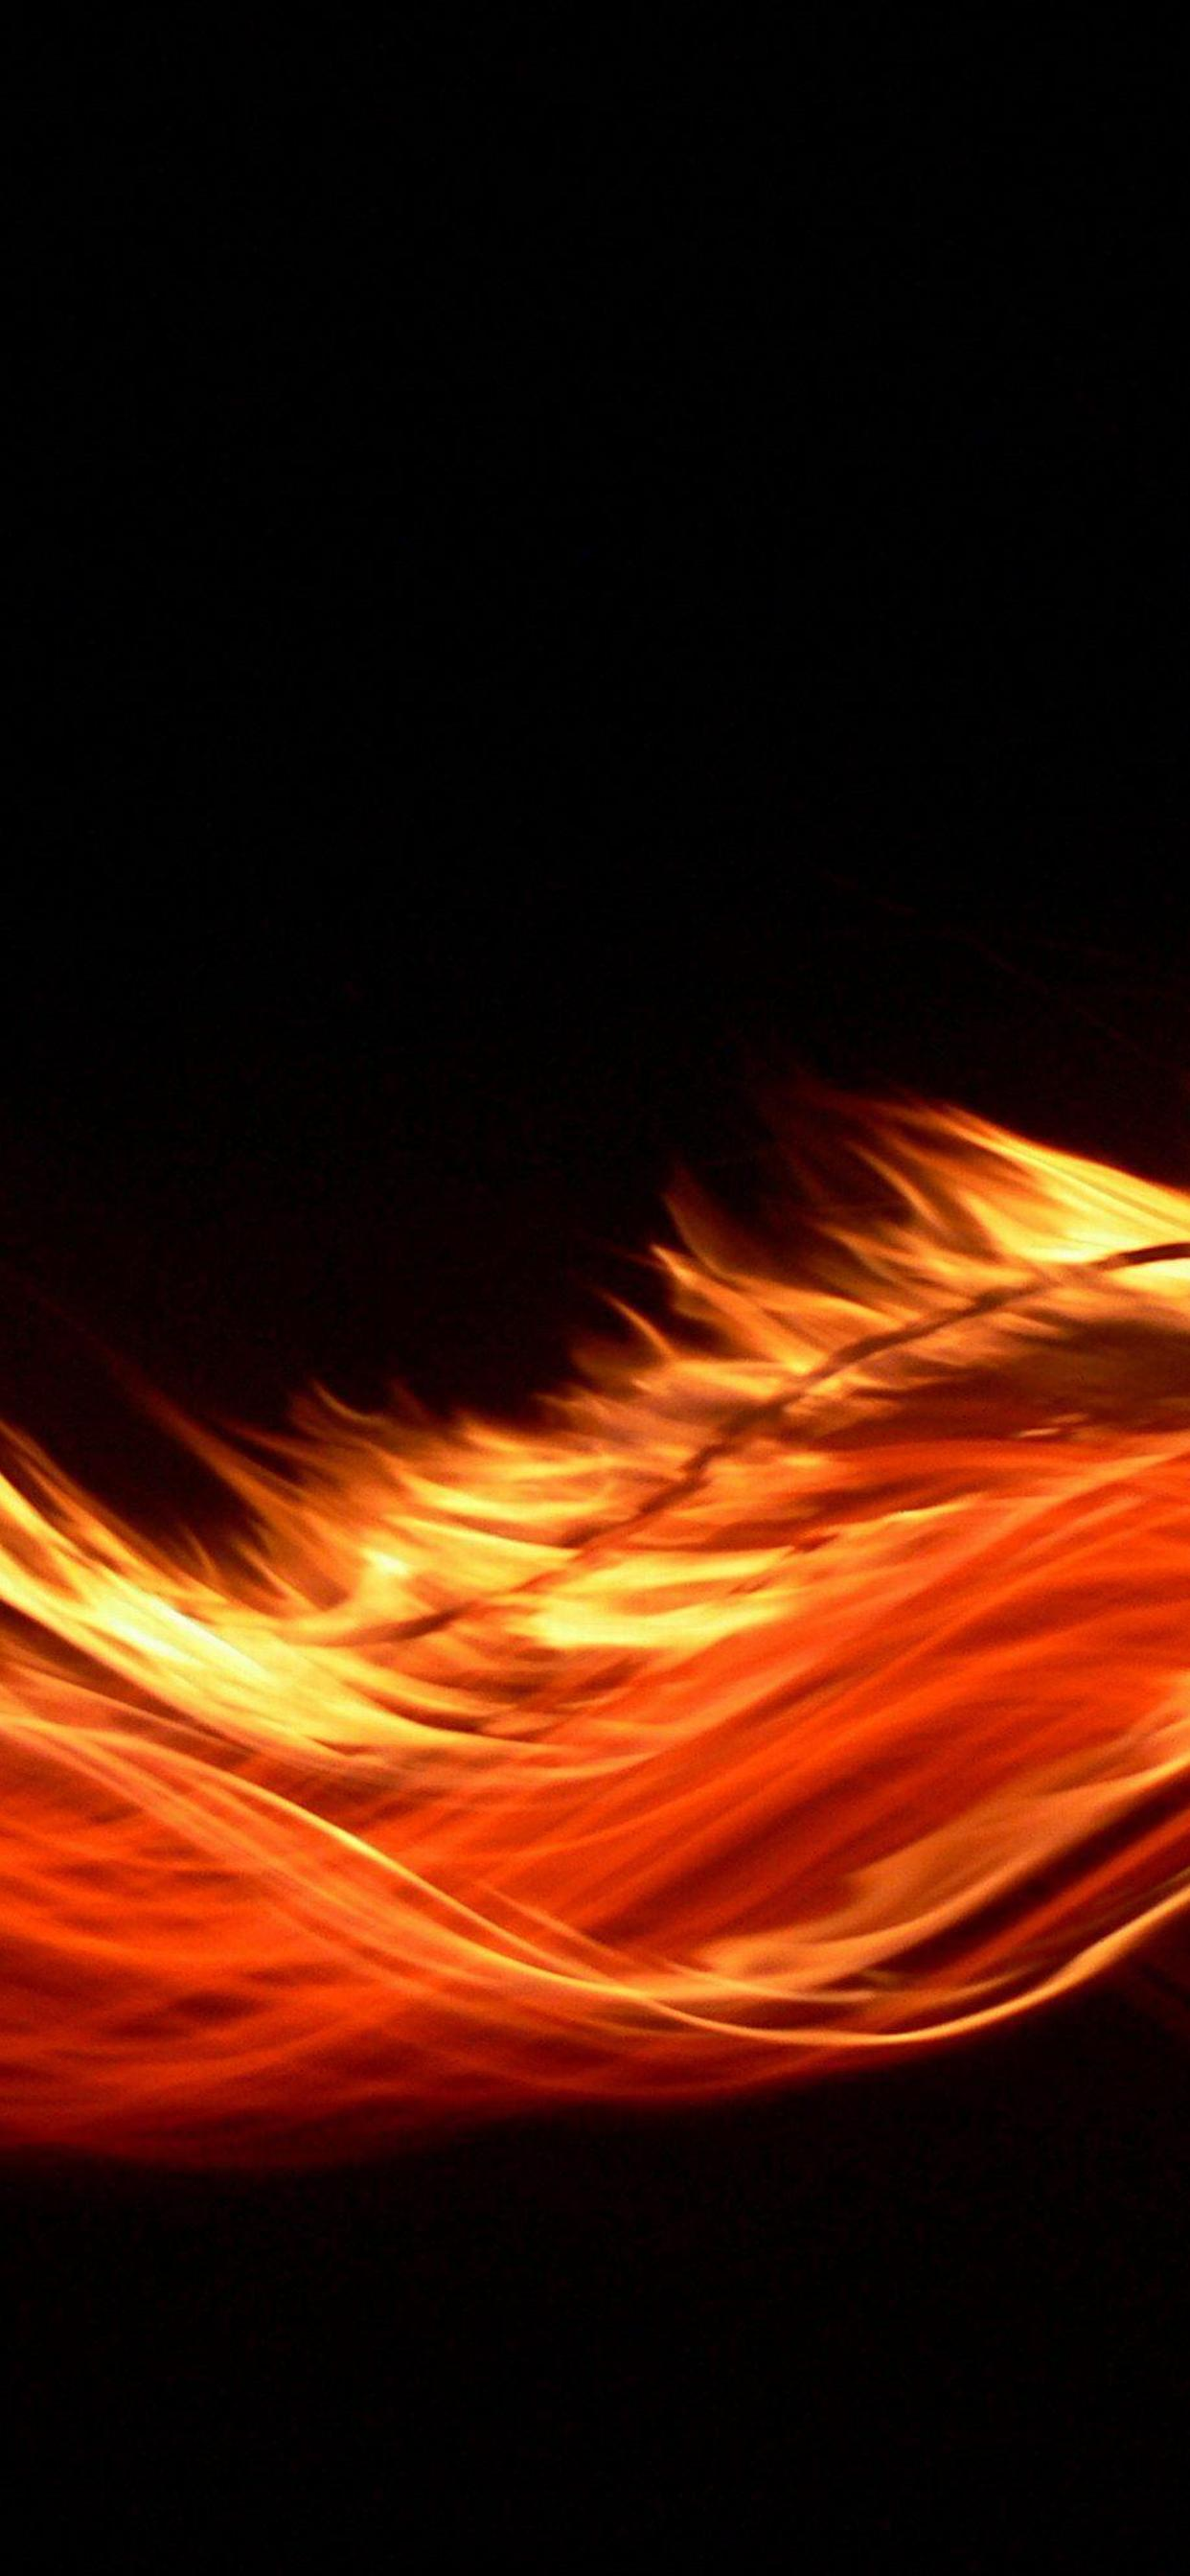 Orange Fire On A Dark Background Hd Wallpaper